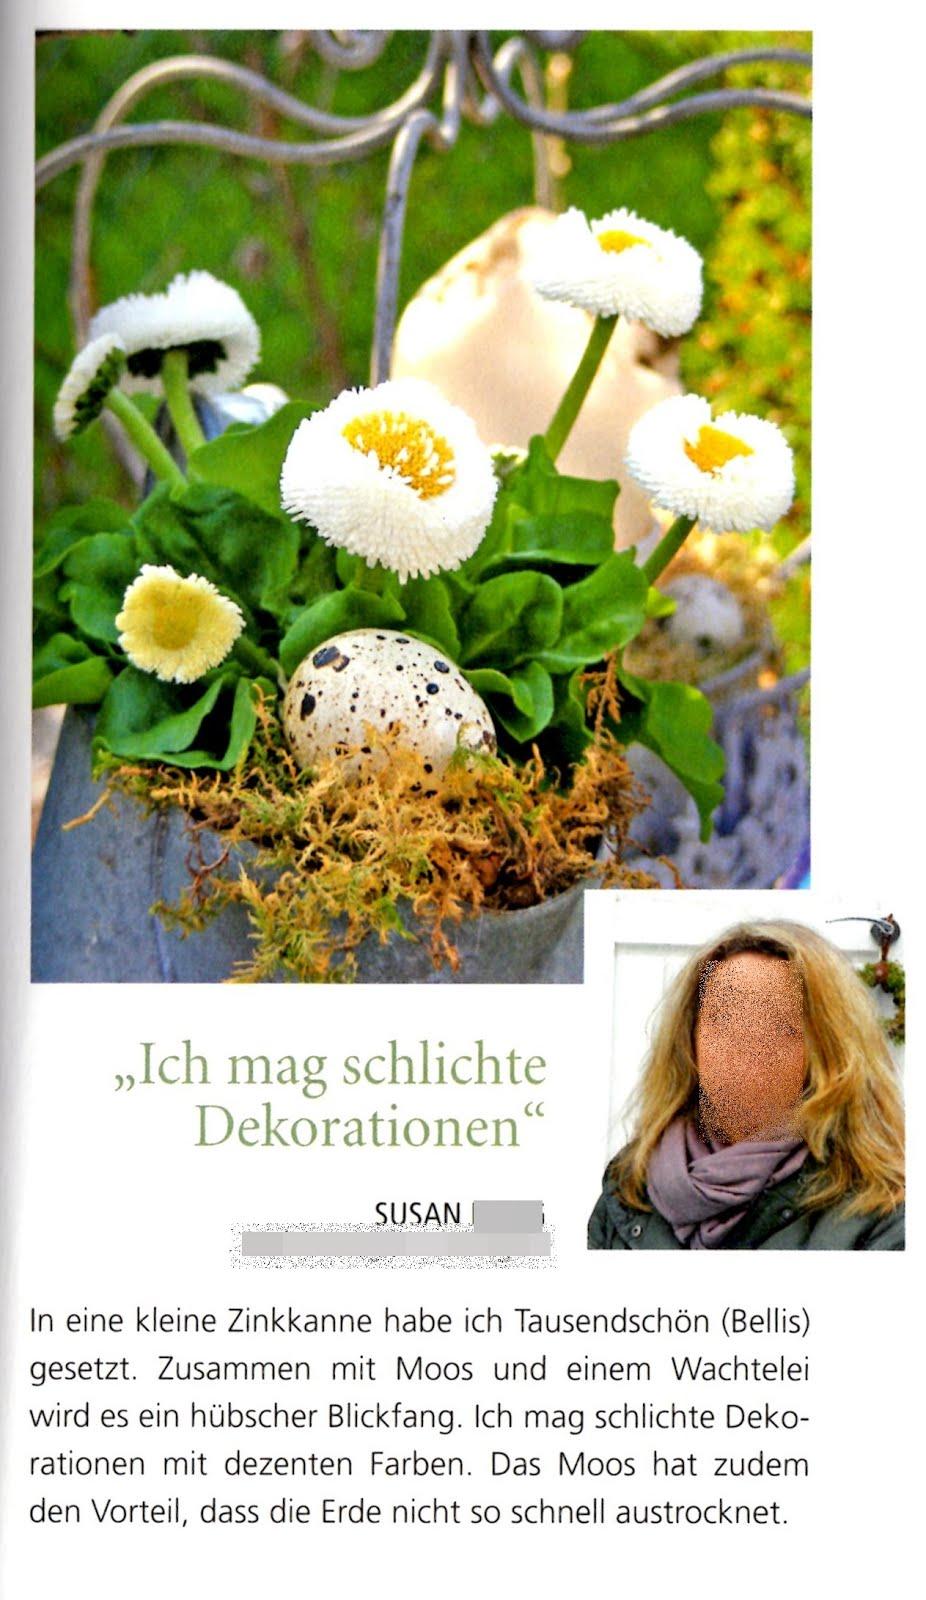 Bilder meines Gartens in den Medien